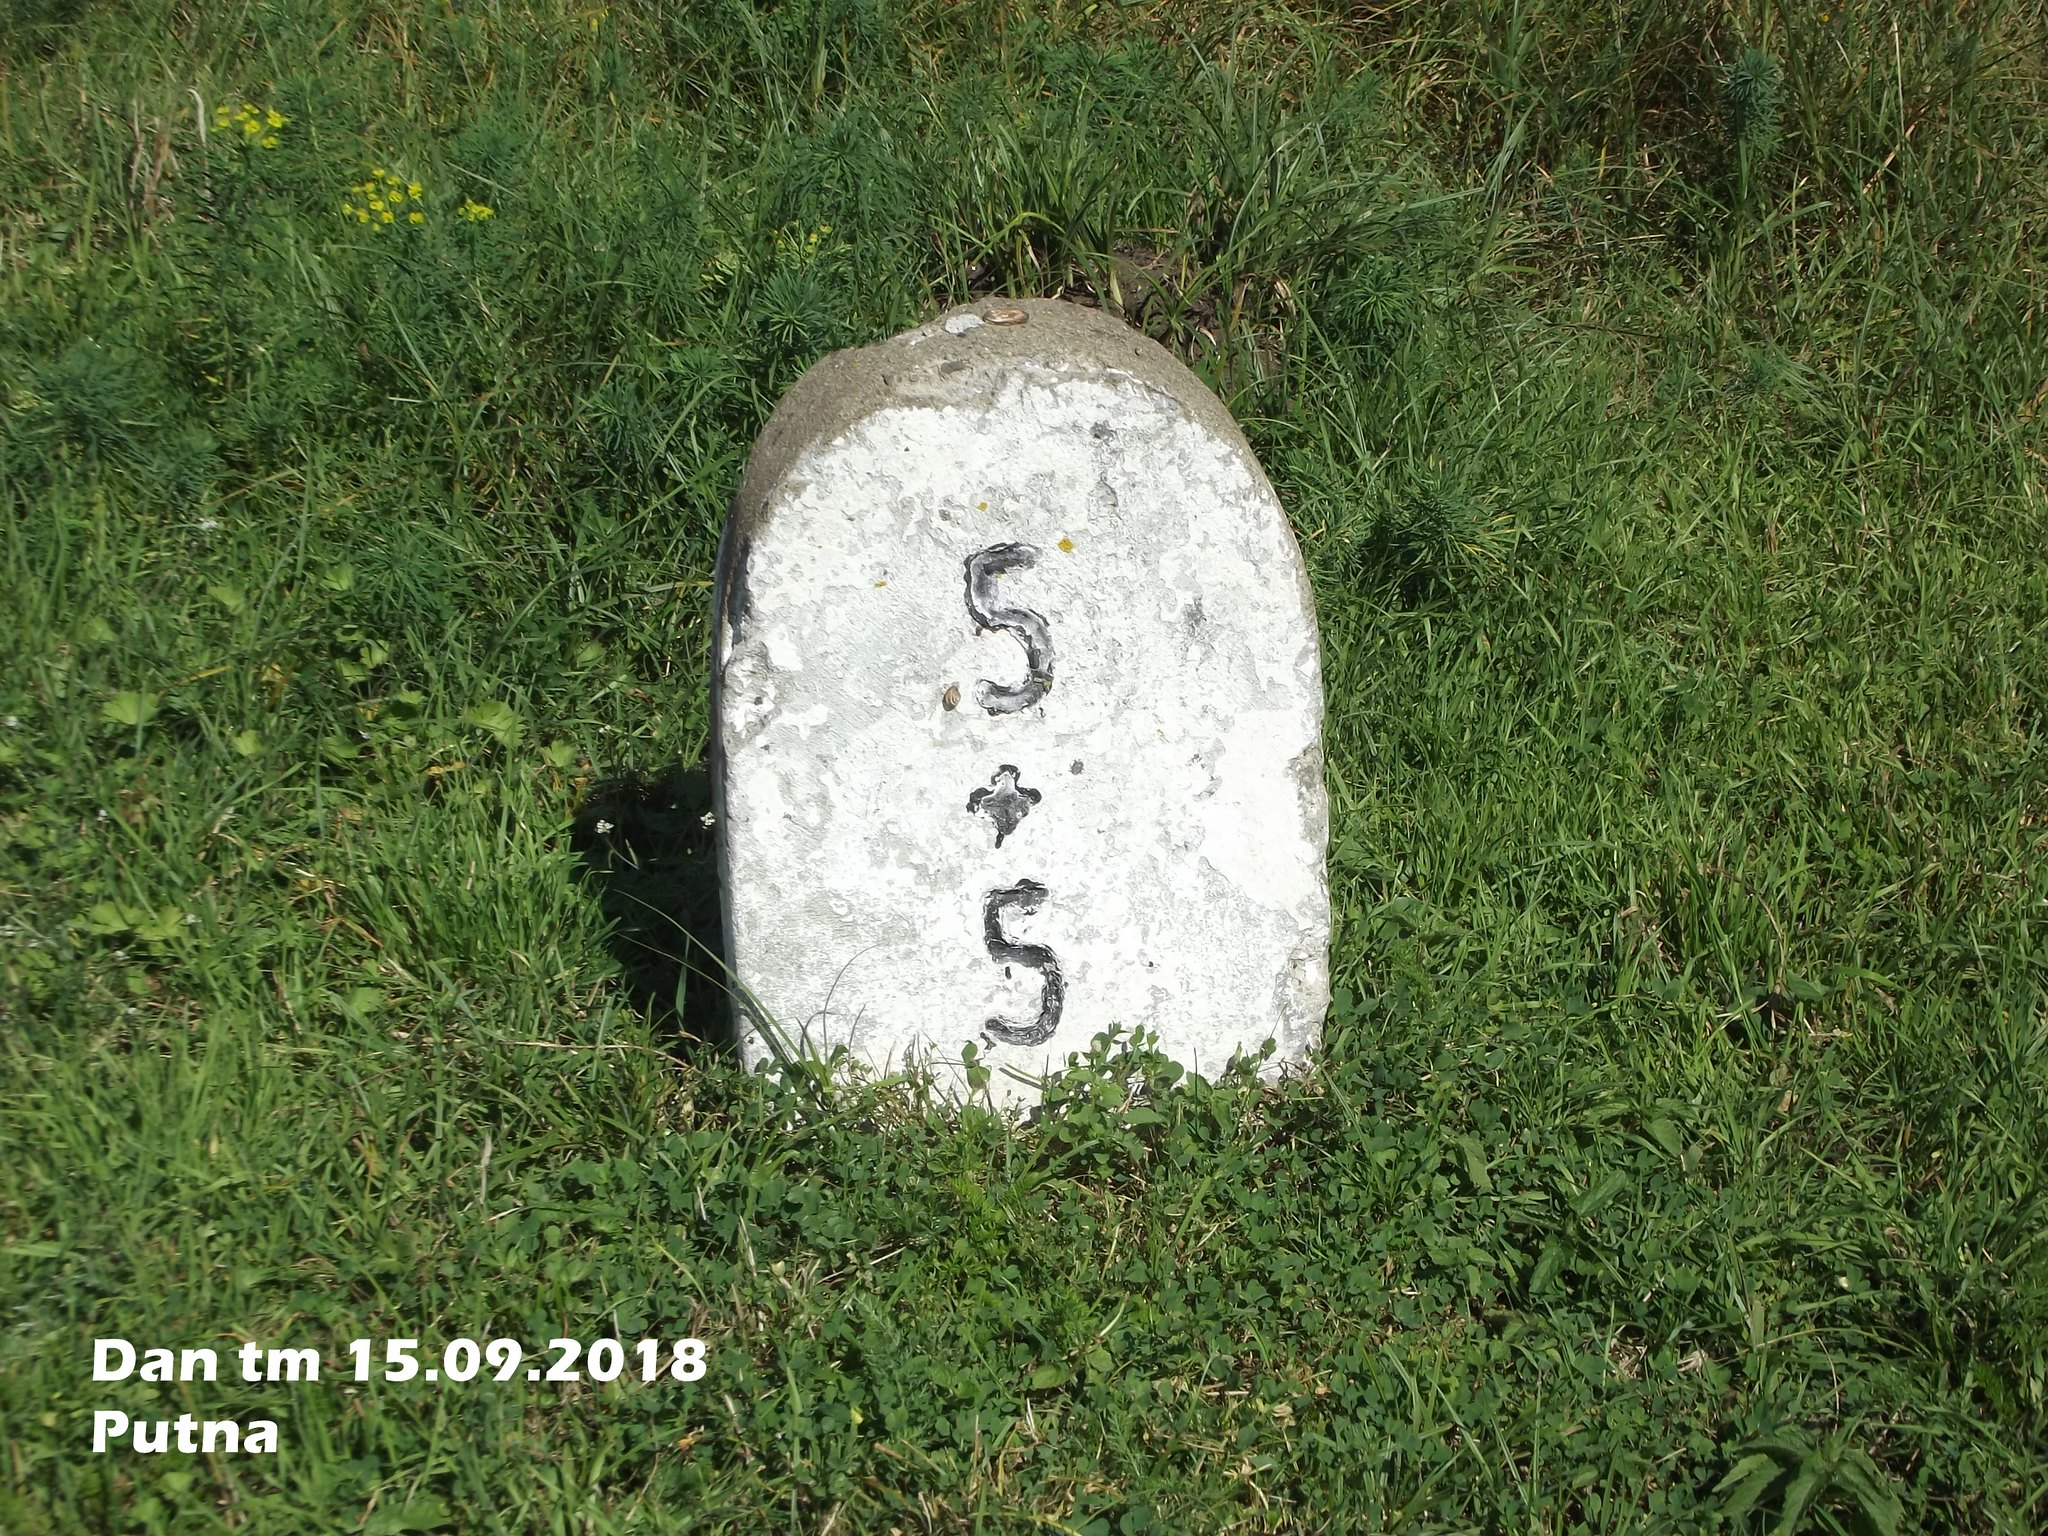 515 : Dorneşti - Gura Putnei - (Putna) - Nisipitu - Seletin UKR - Pagina 47 43826158735_622443238e_k